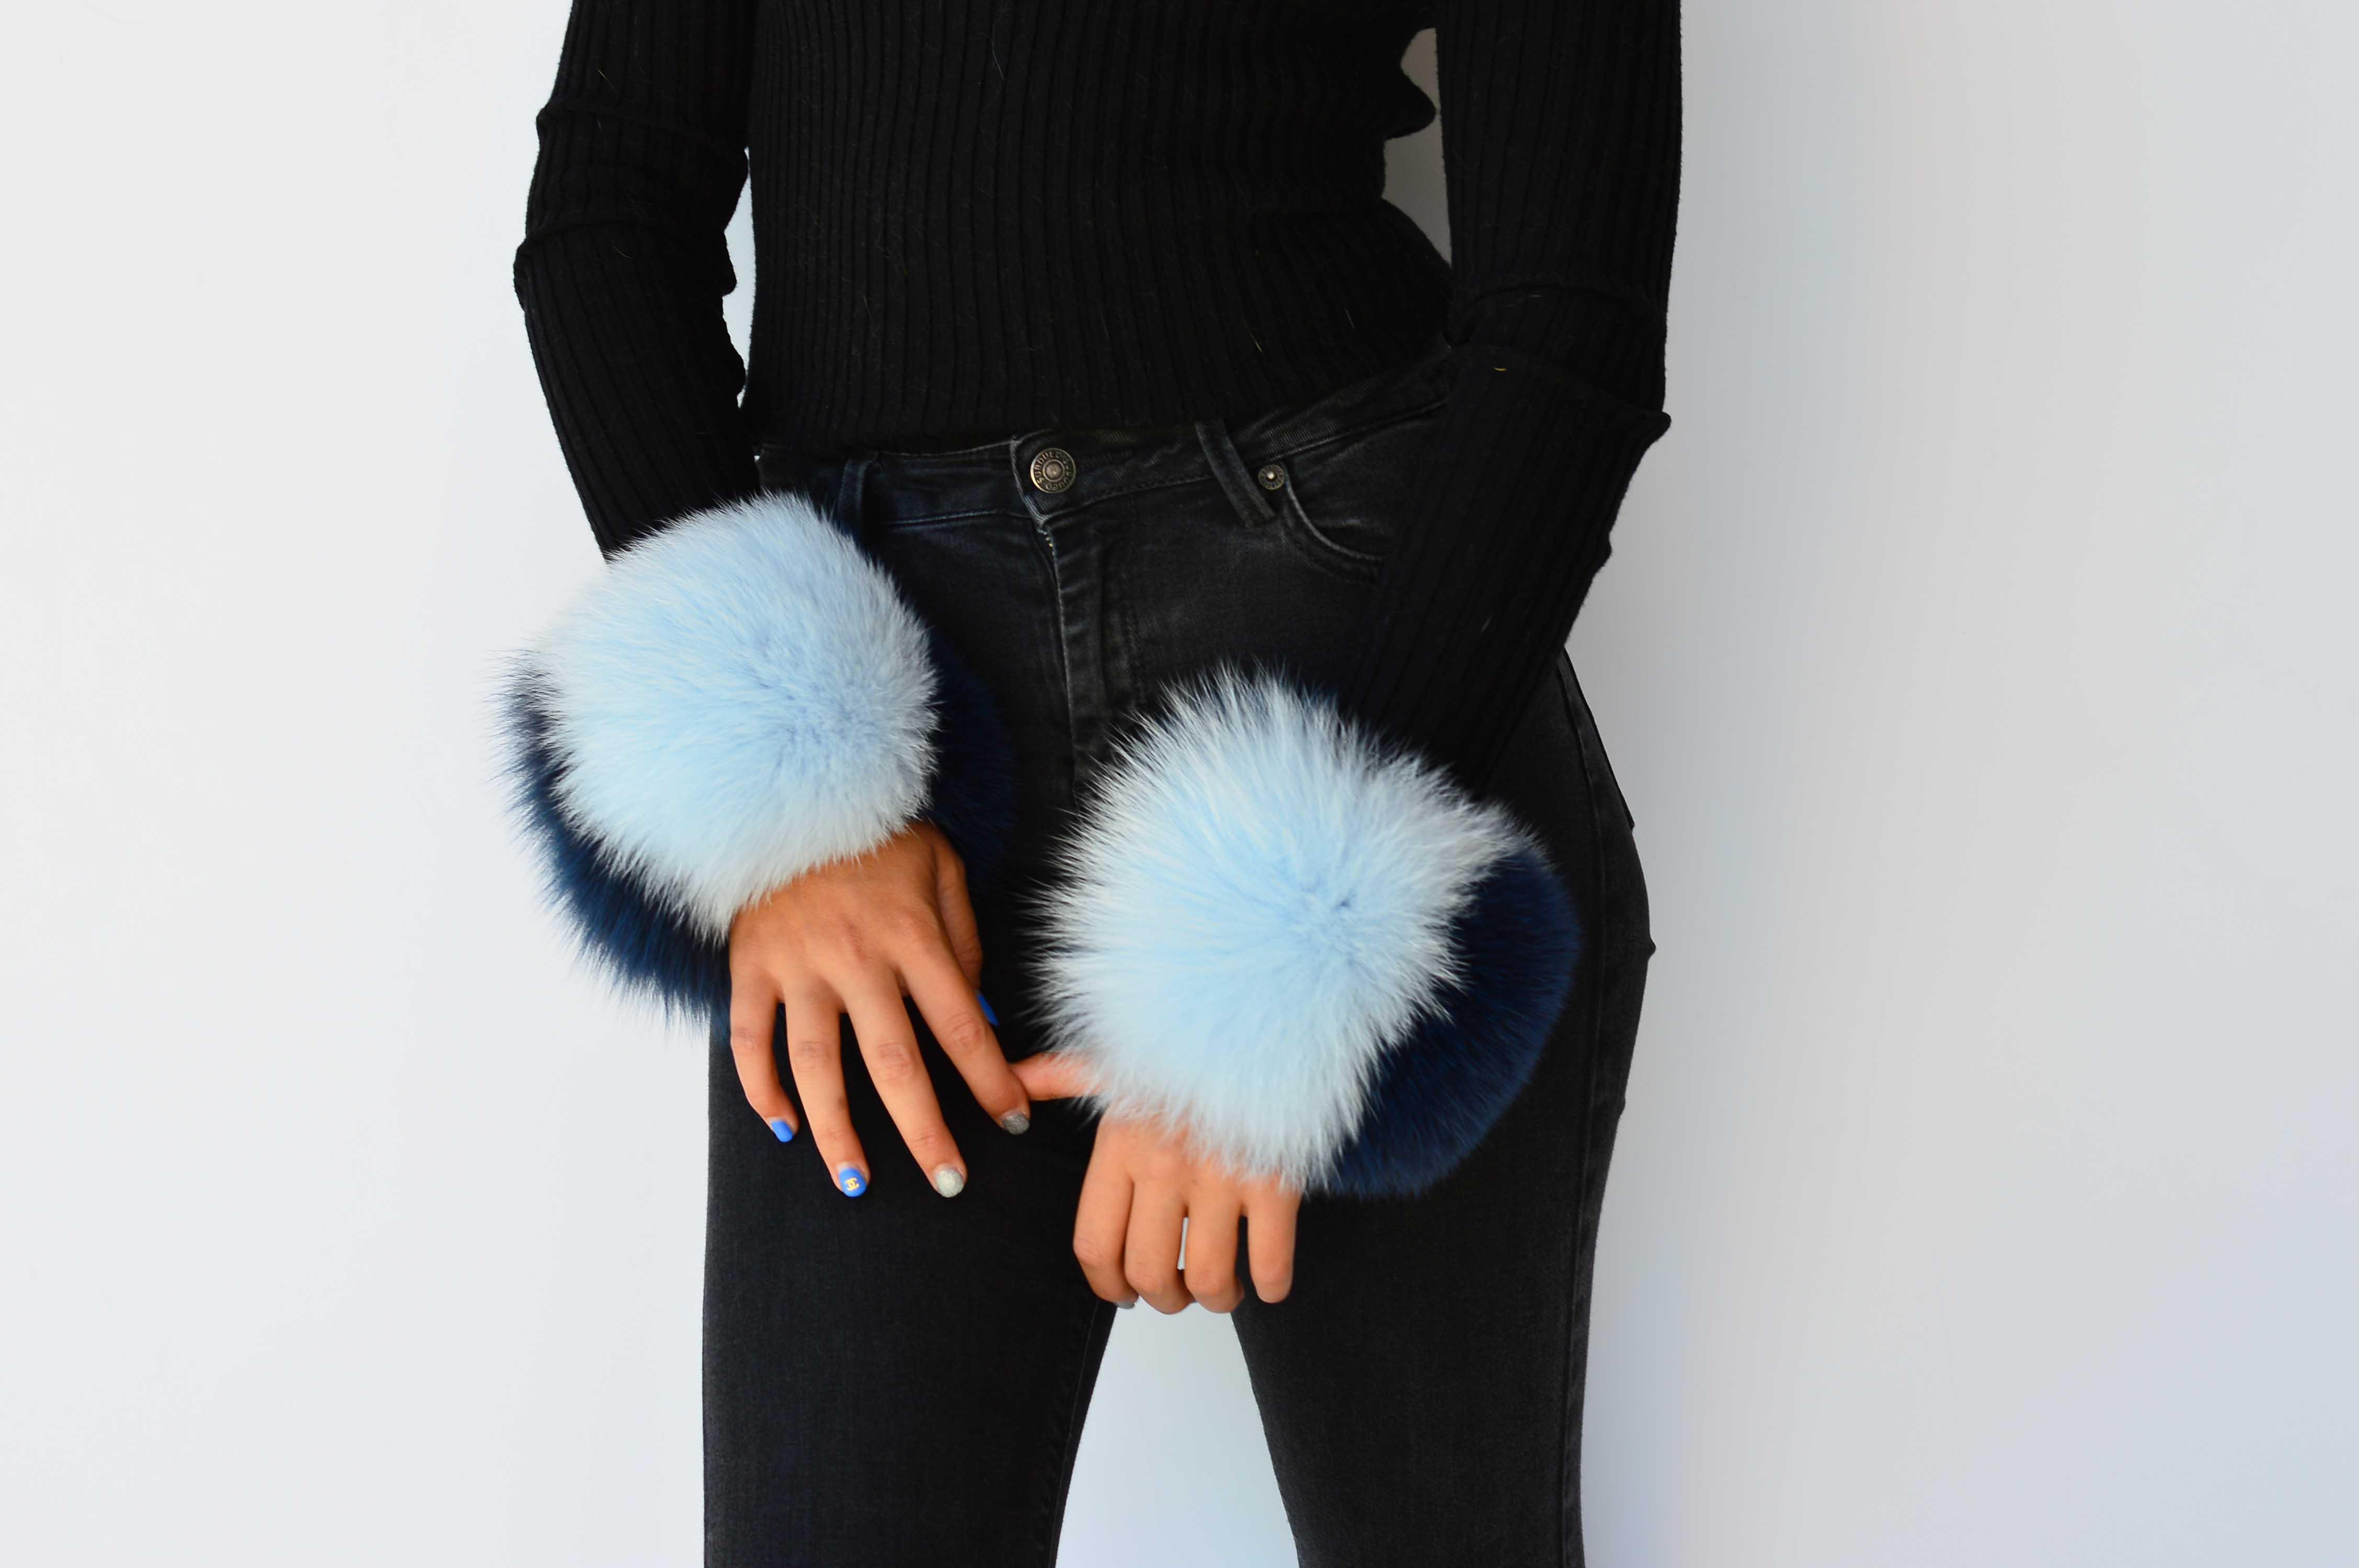 Polsi Clic Clac in pelliccia di volpe colorata azzurro e blu